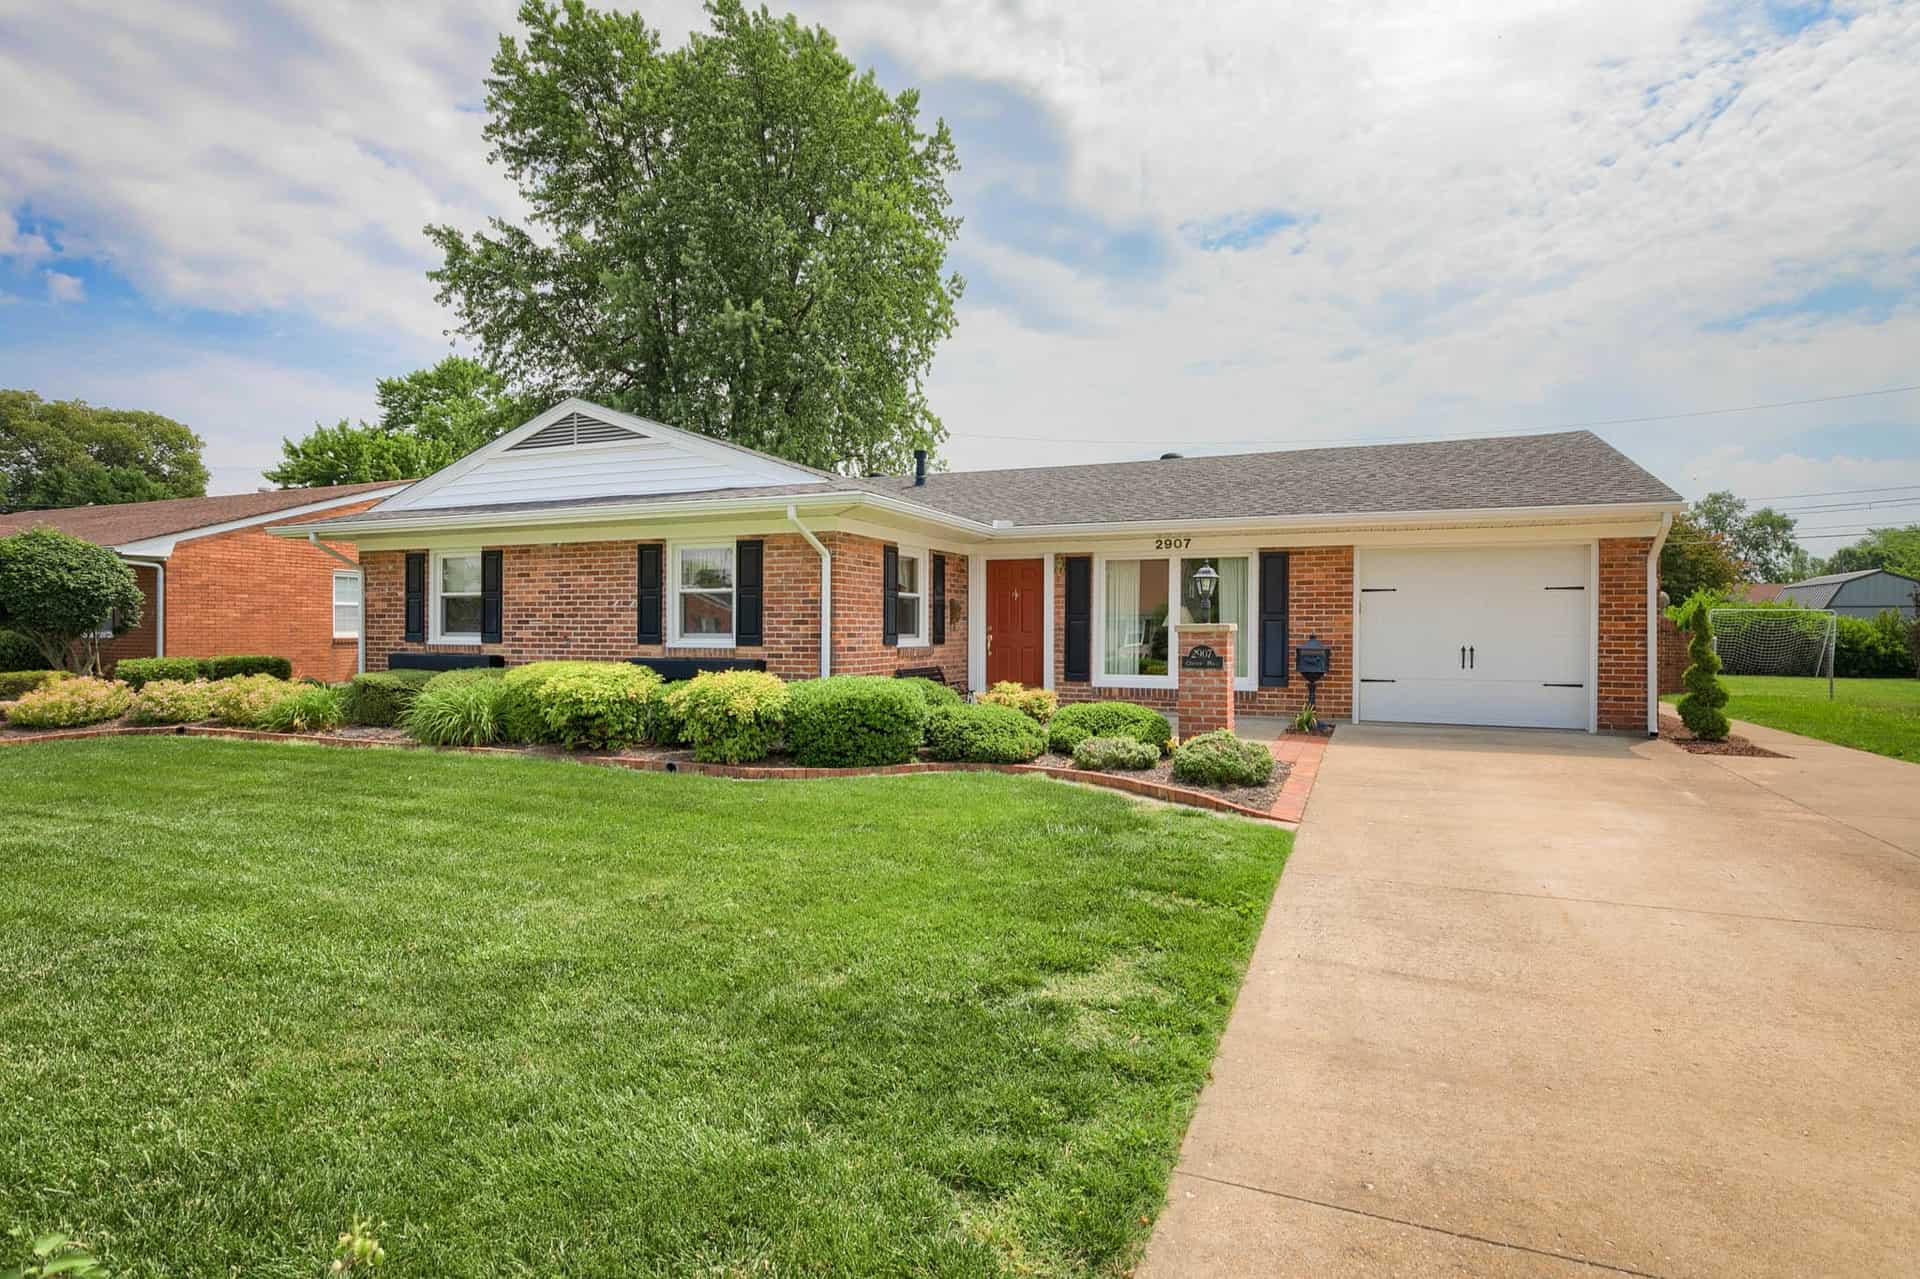 2907 Christie Place, Owensboro, KY 42301